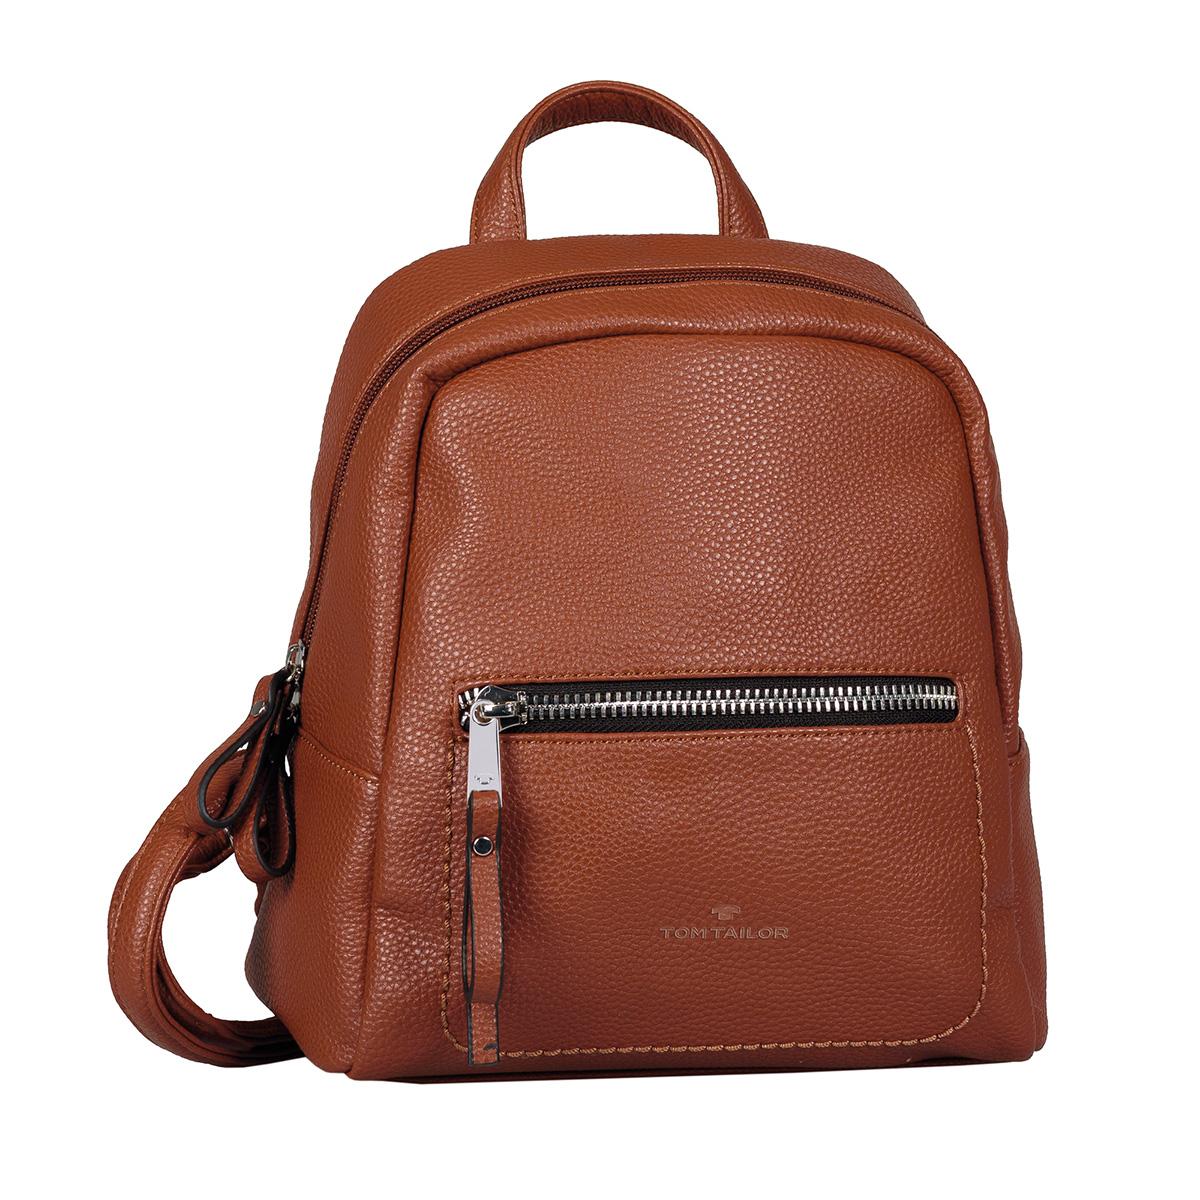 Tom Tailor Damen Juna Backpack City Rucksack Daypack 24419